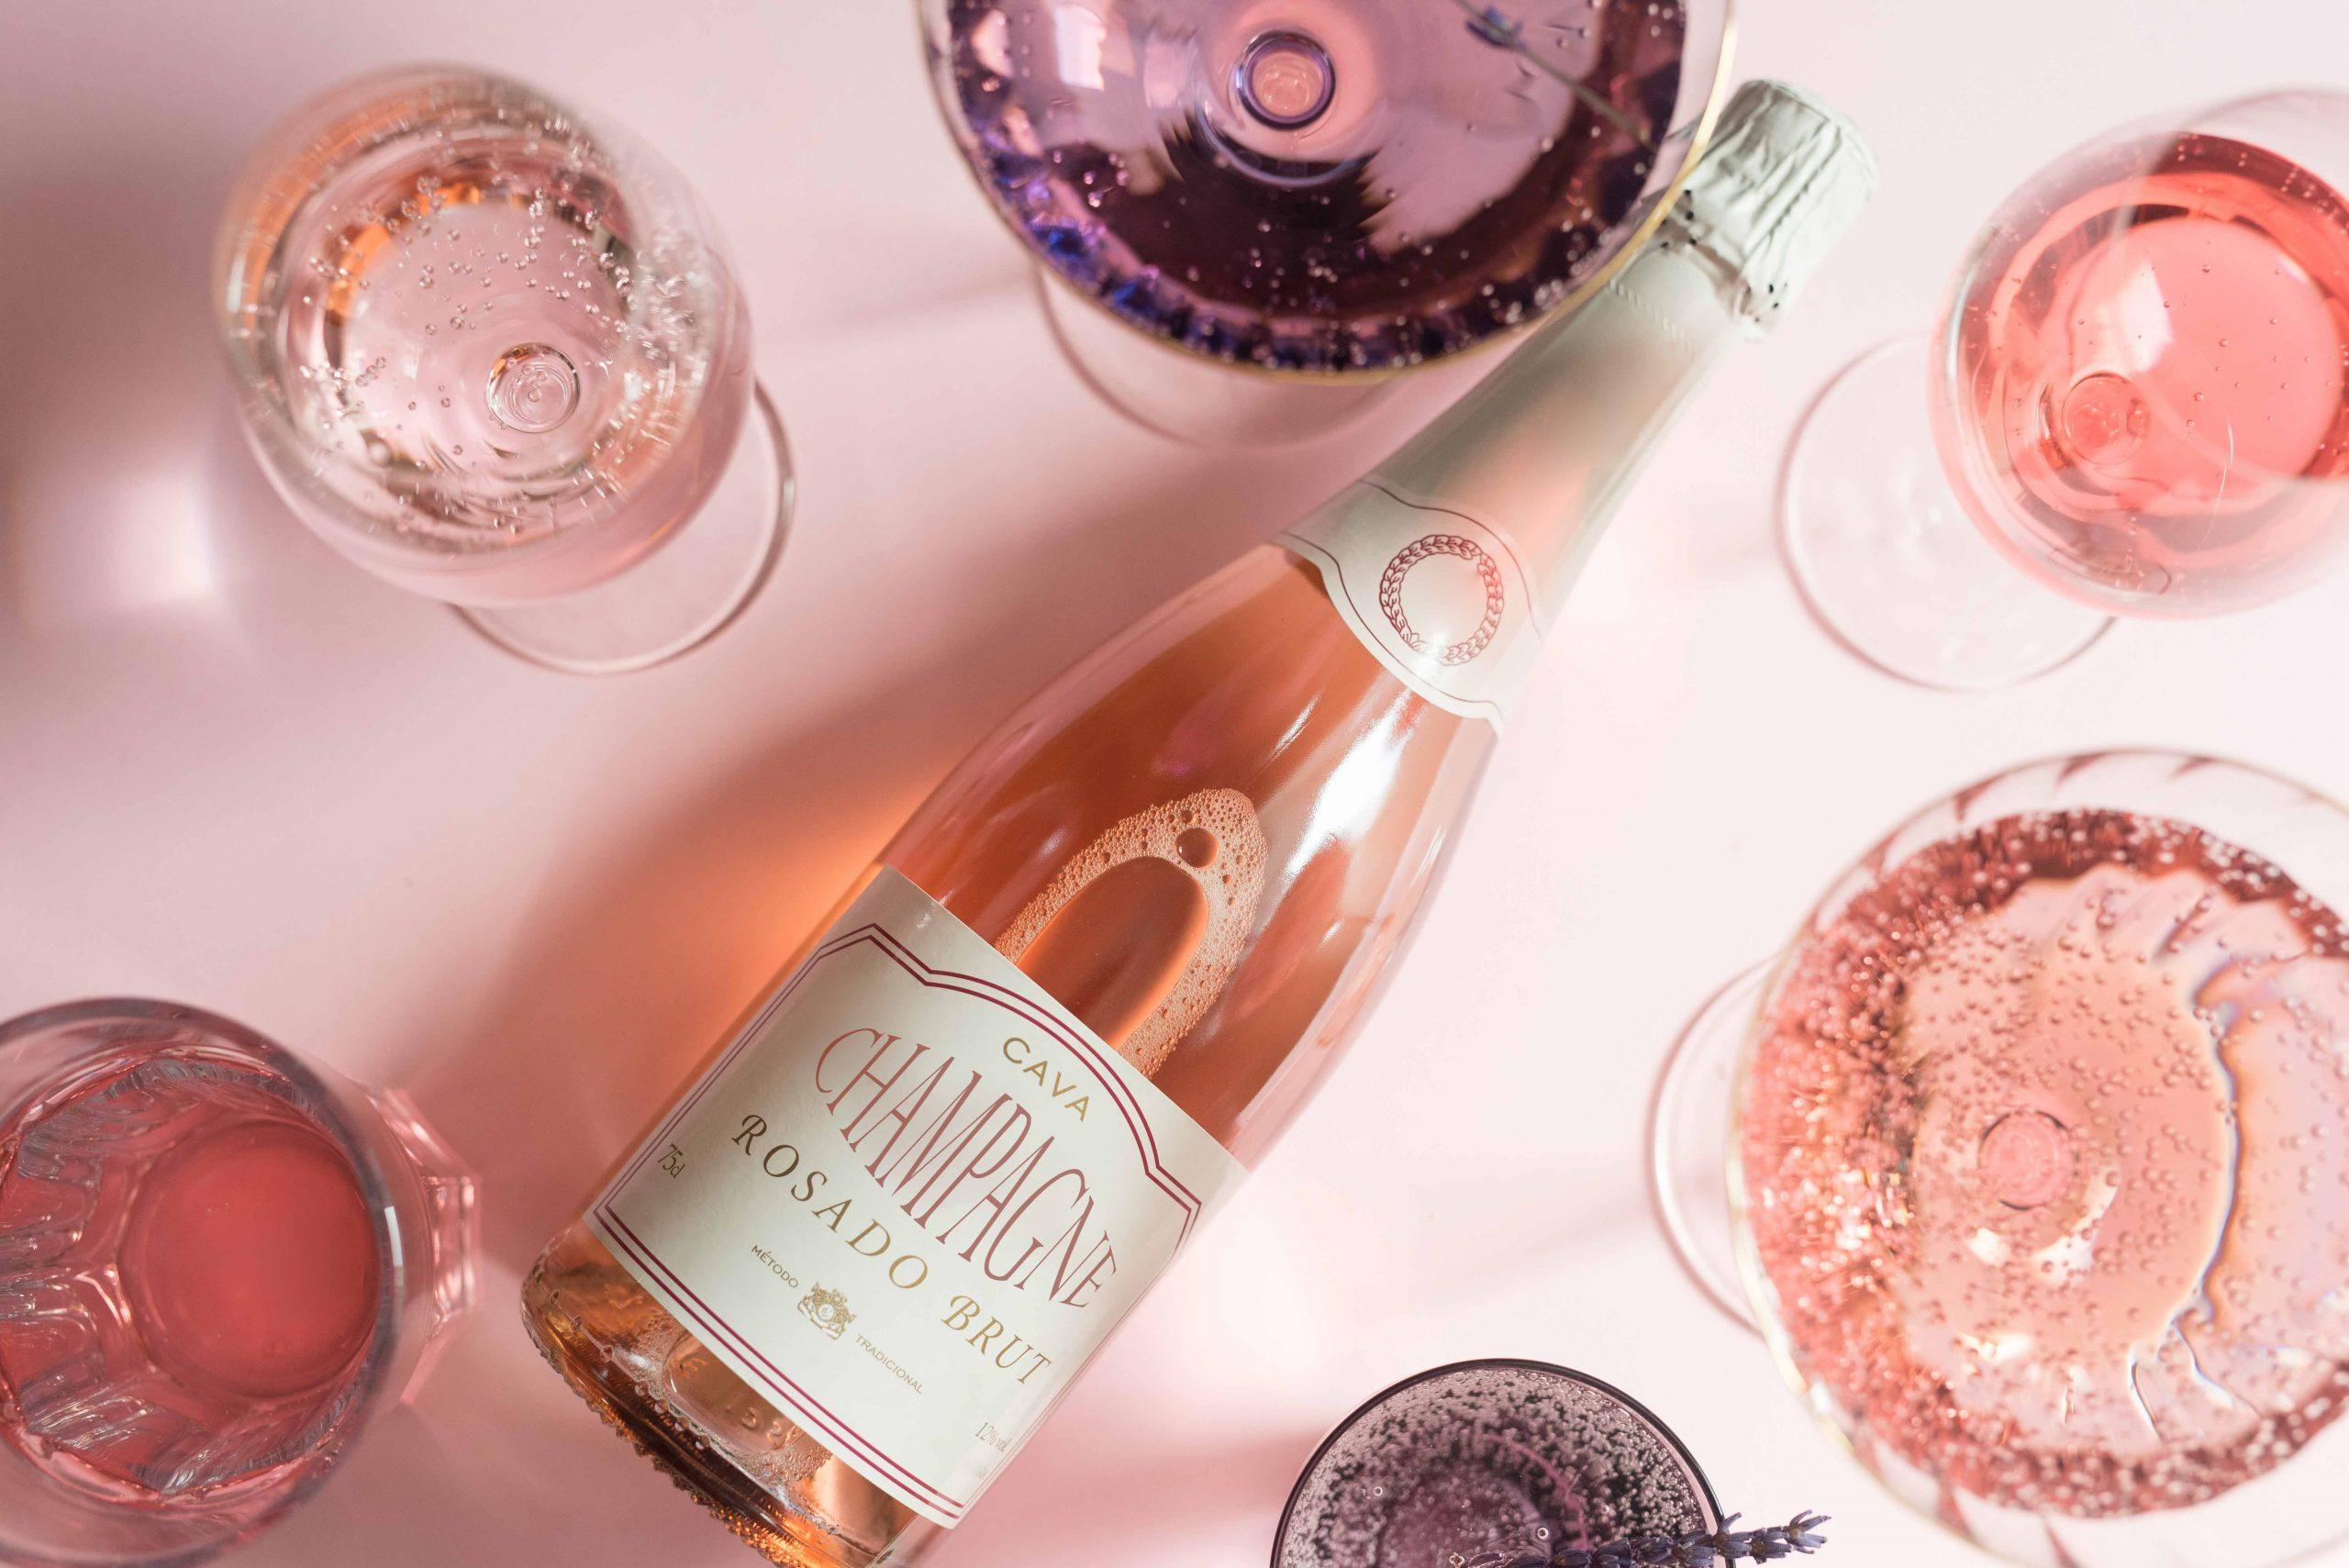 Dr. Stephan Bücker – Aldi, Champagner Sorbet und Birne